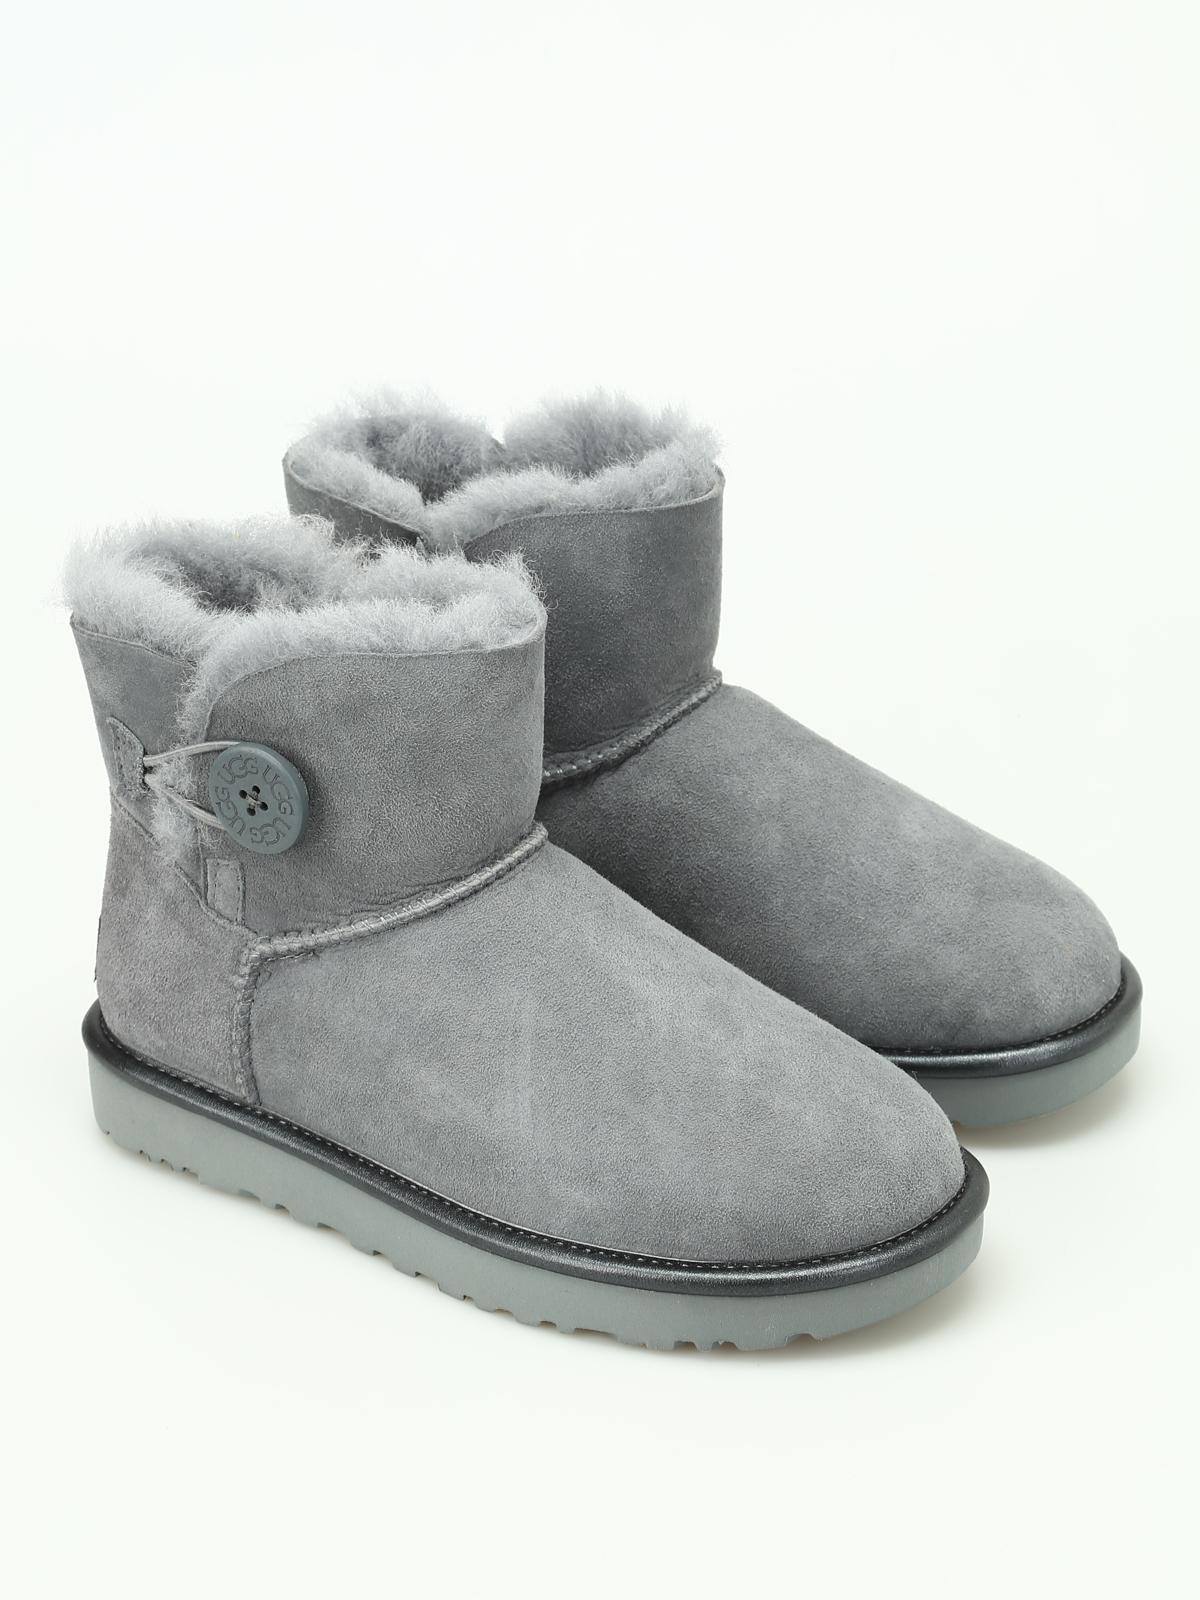 5ff3eecb248 Ugg - Grey Mini Bailey Button II Metallic - ankle boots - 1019031WGYS